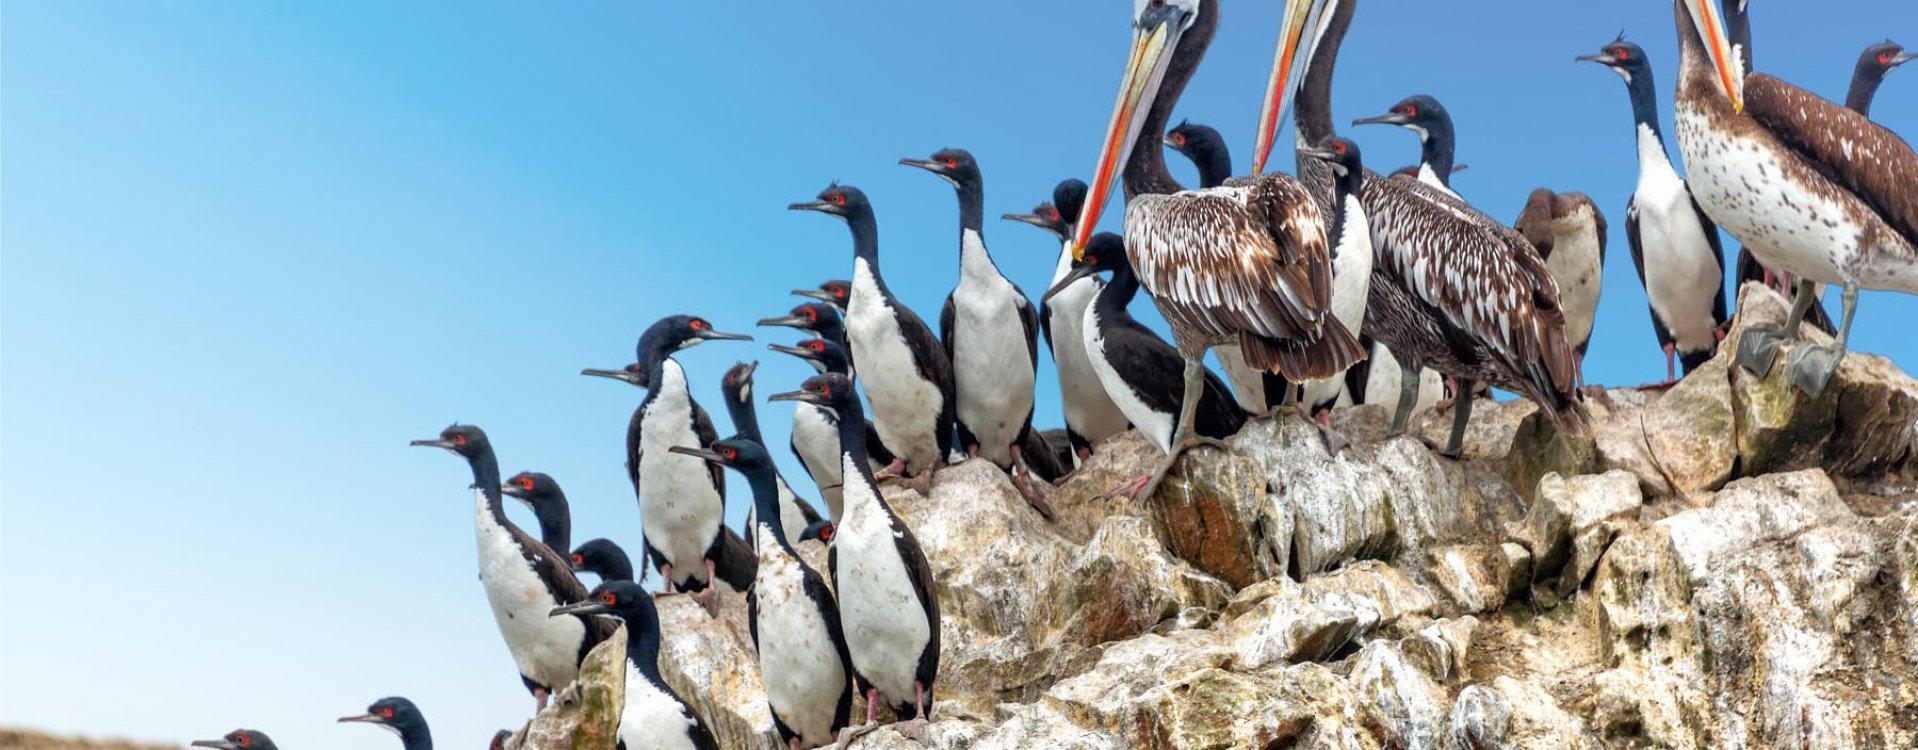 De Ballestas eilanden